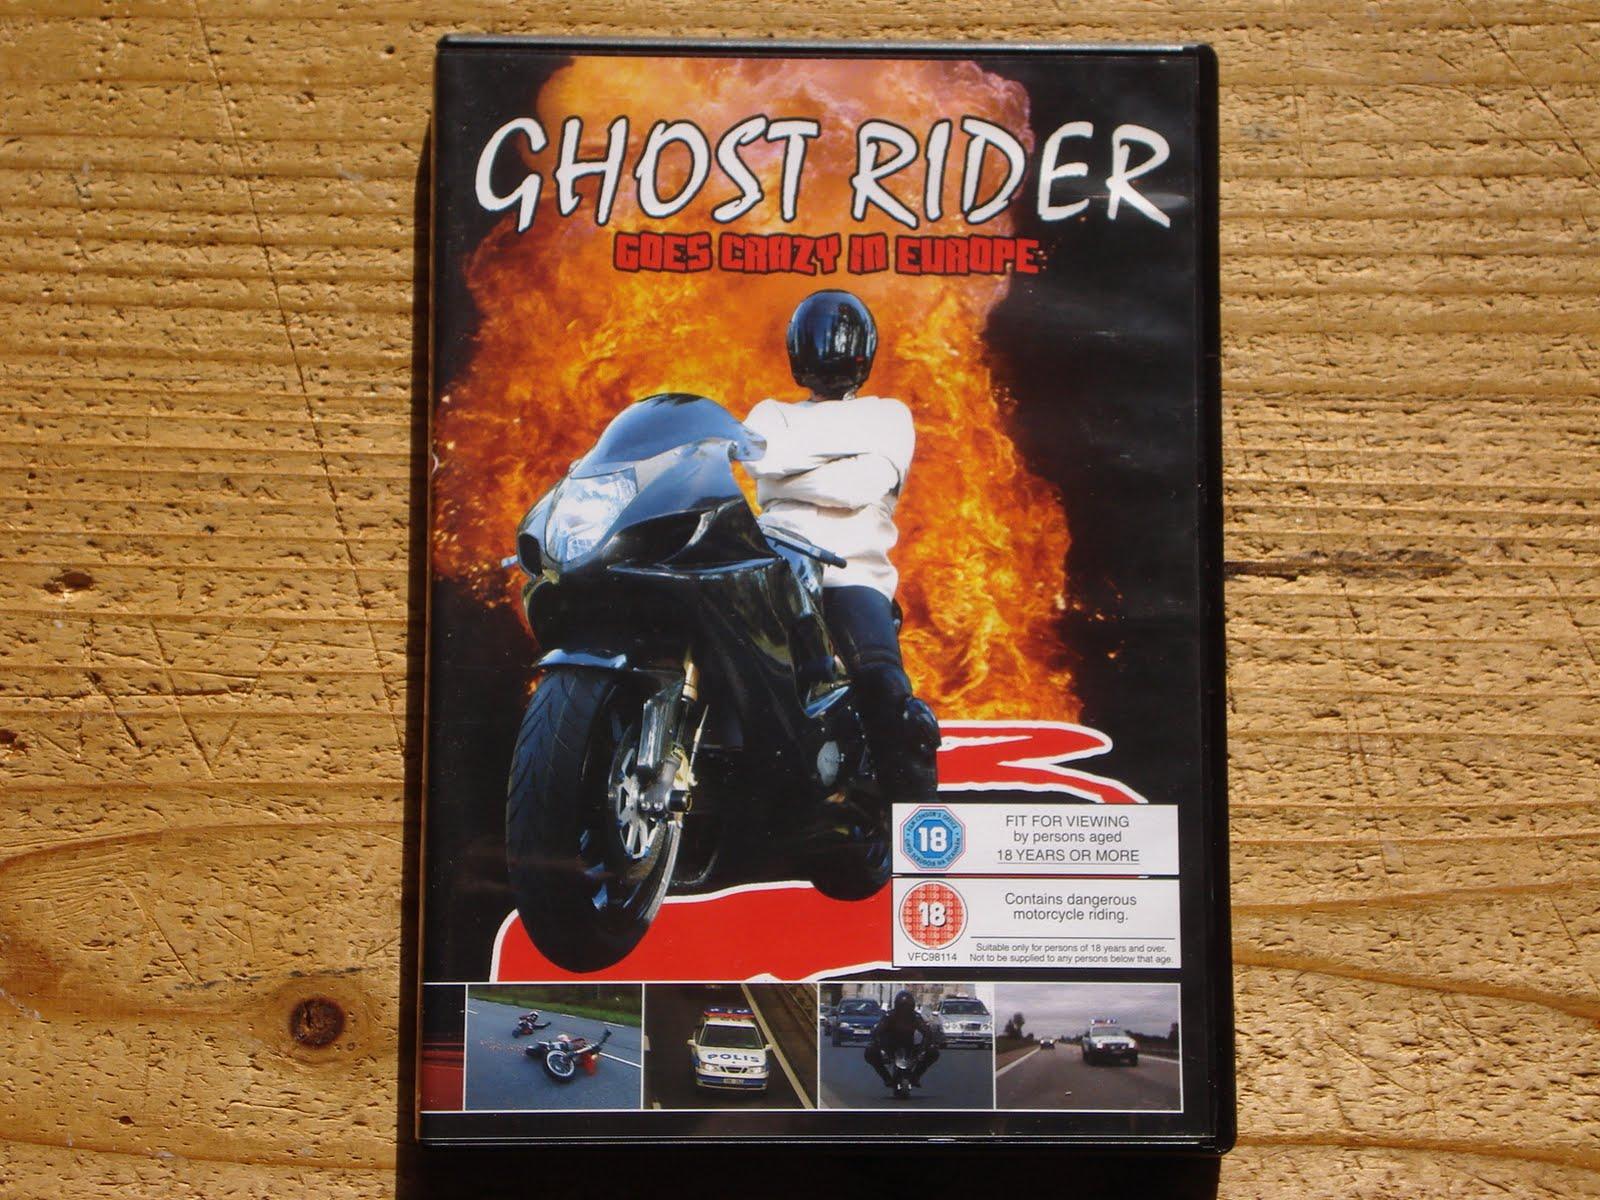 Ghost rider sextoons porn movie